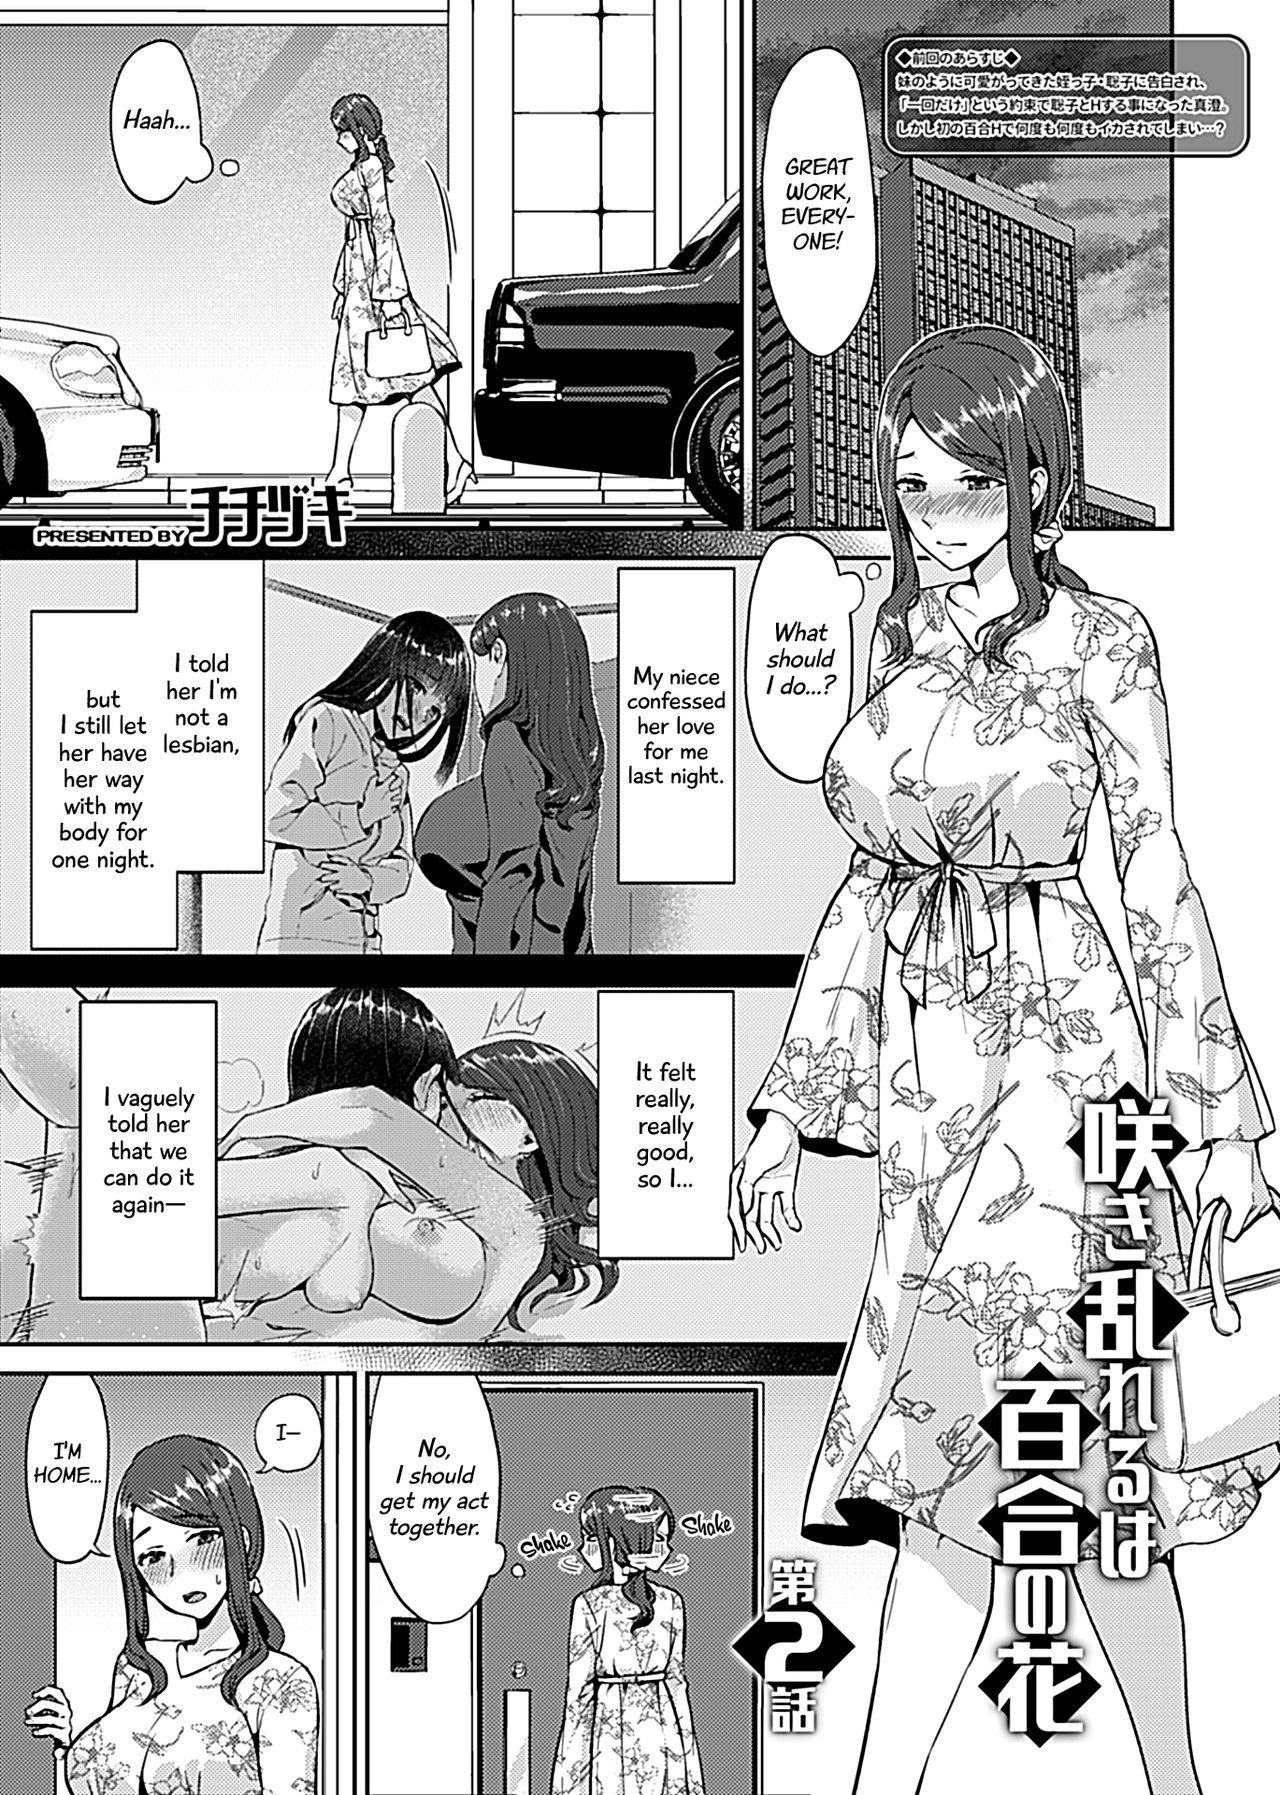 Saki Midareru wa Yuri no Hana | The Lily Blooms Addled Ch. 1-4 22